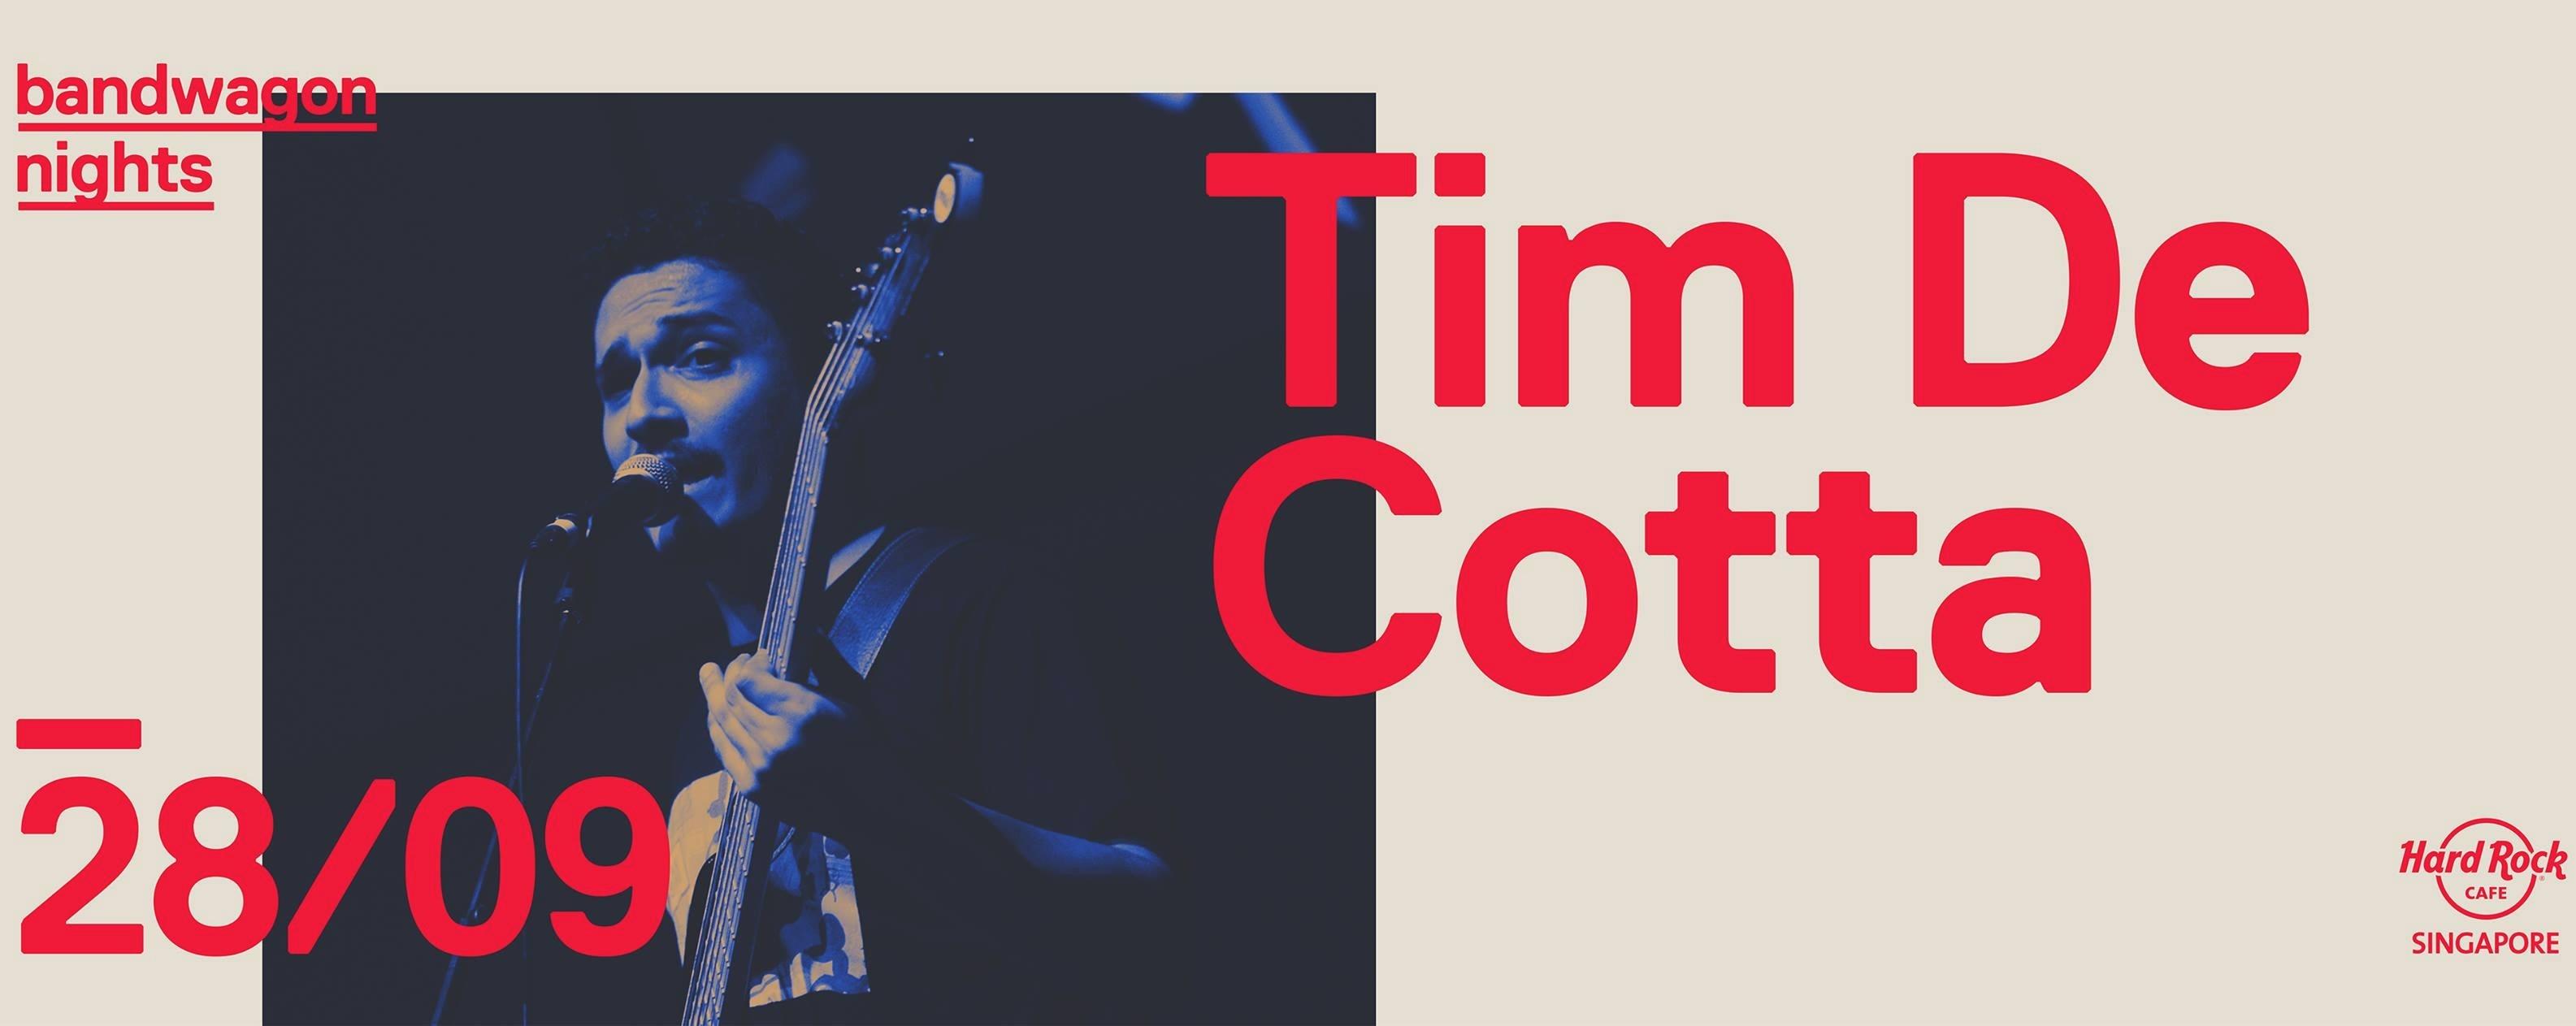 Bandwagon Nights | Tim De Cotta